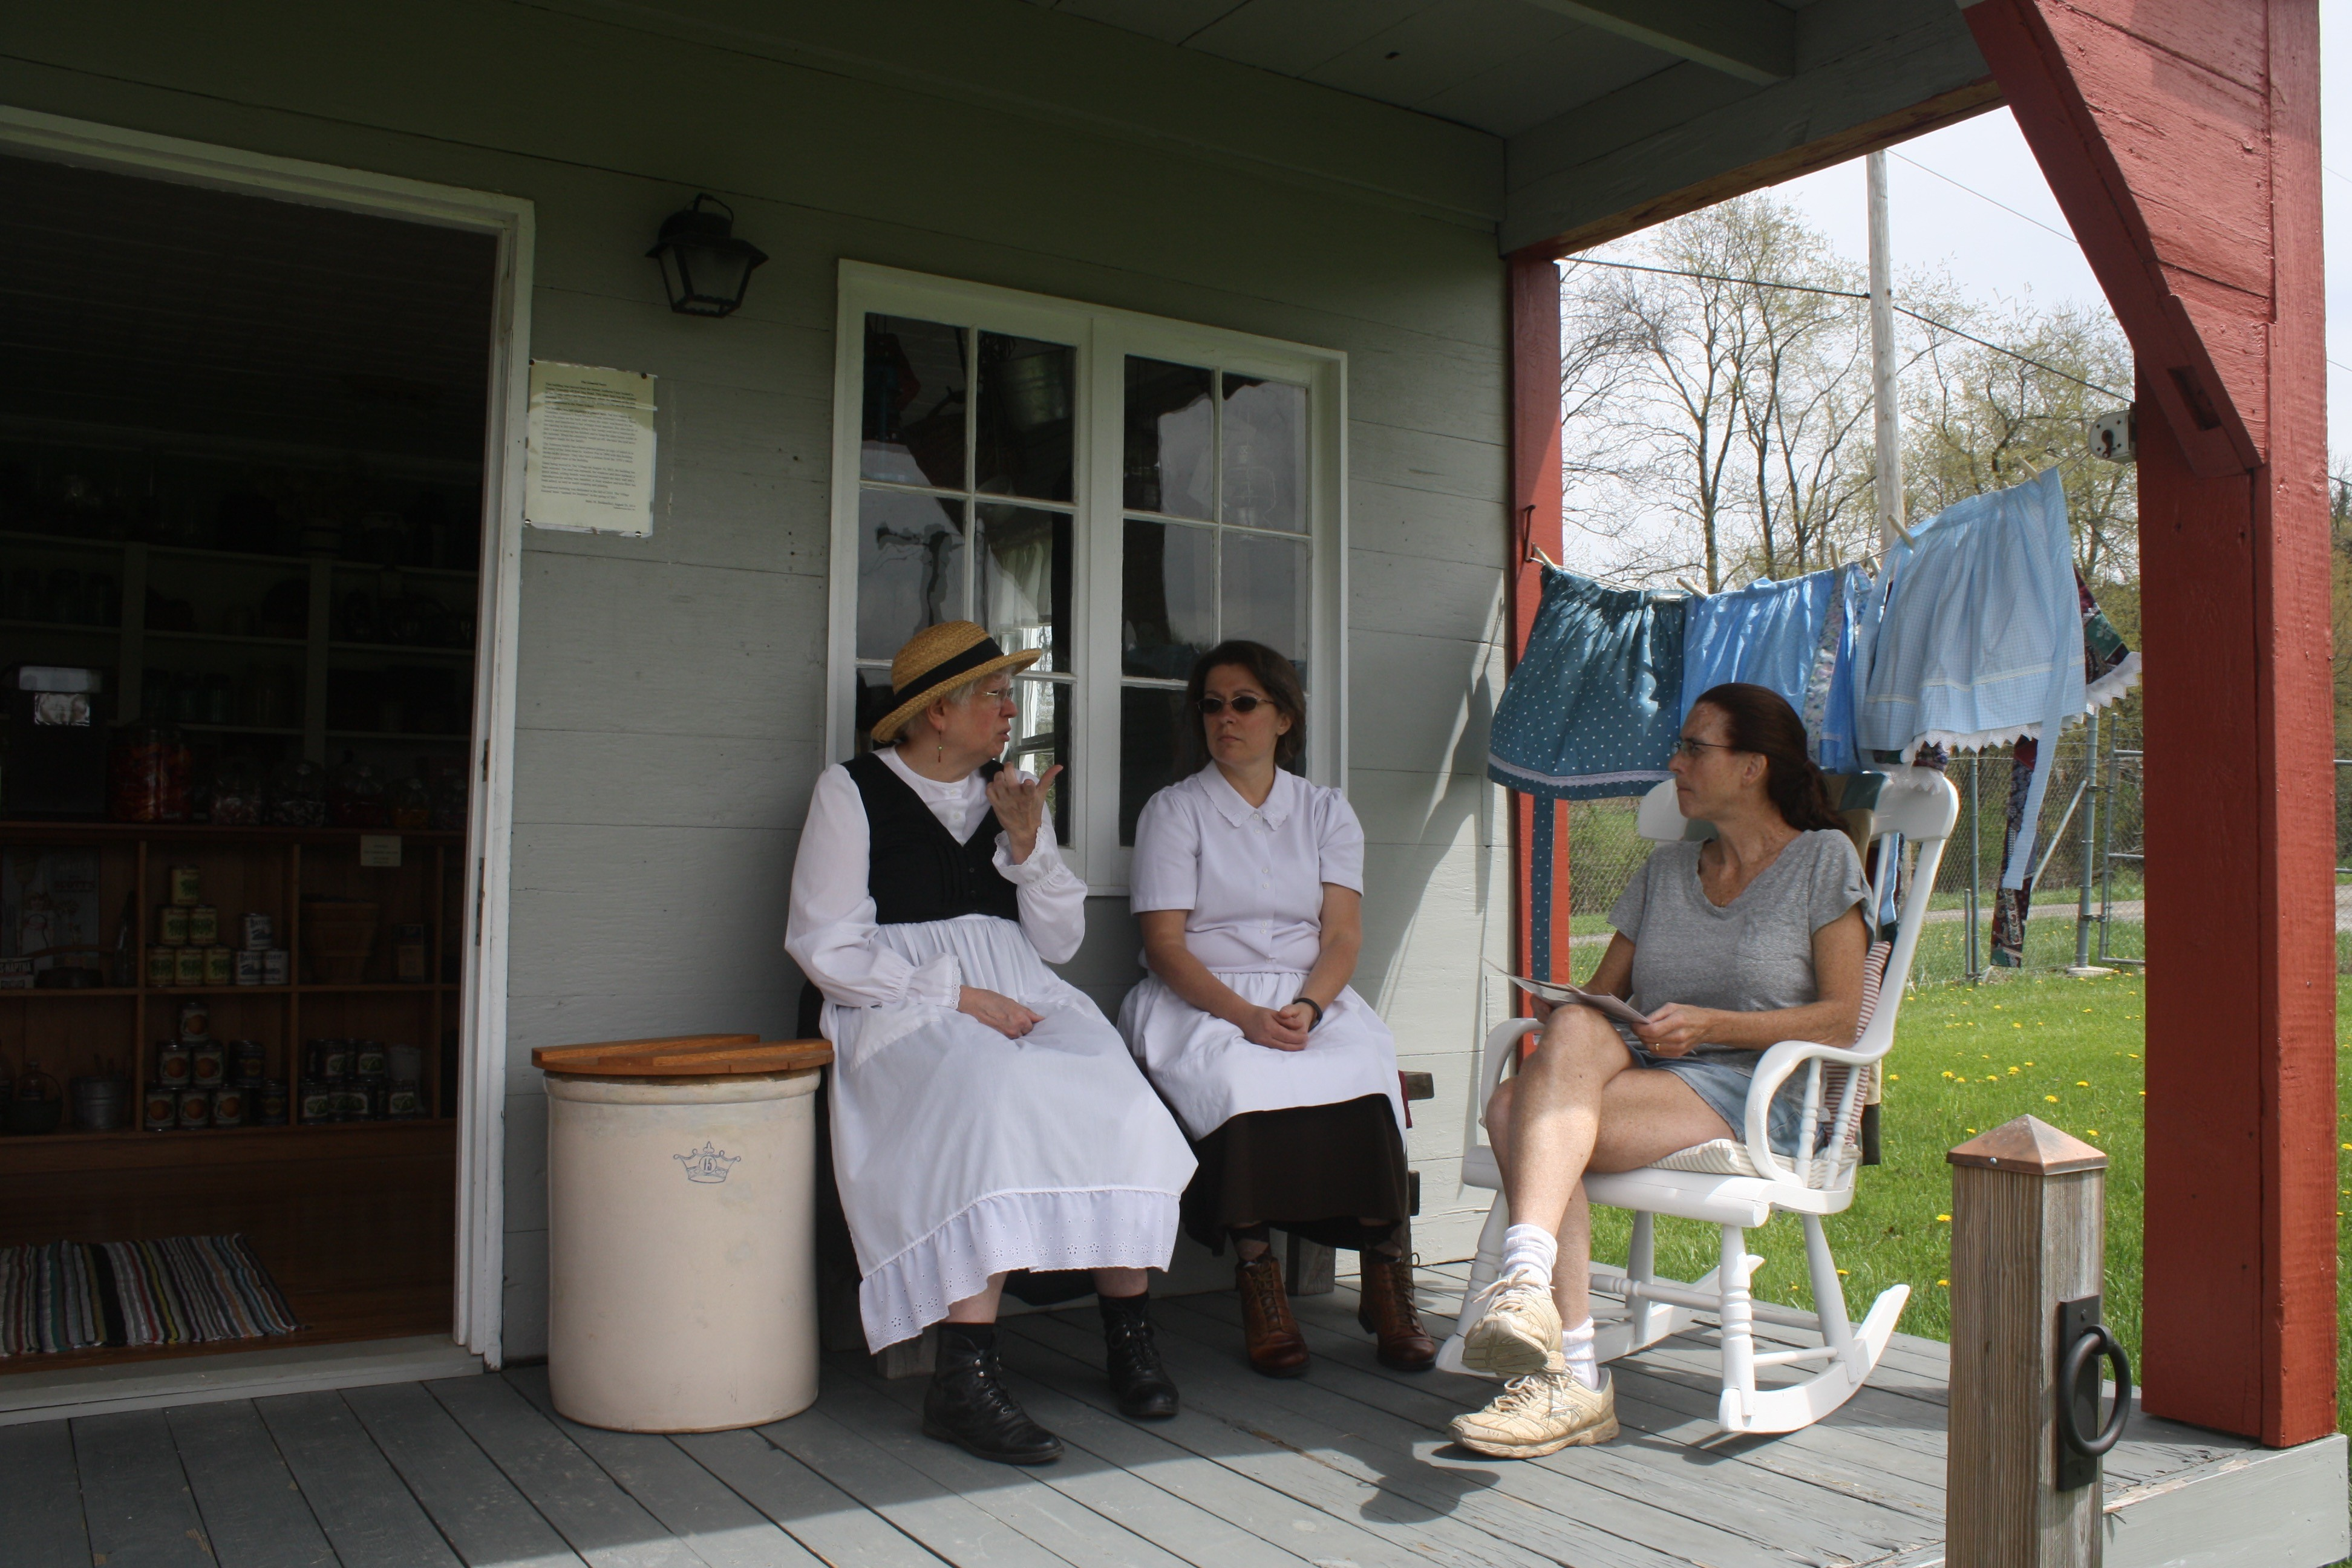 Village Yard Sale | South Side Historical Village Hookstown